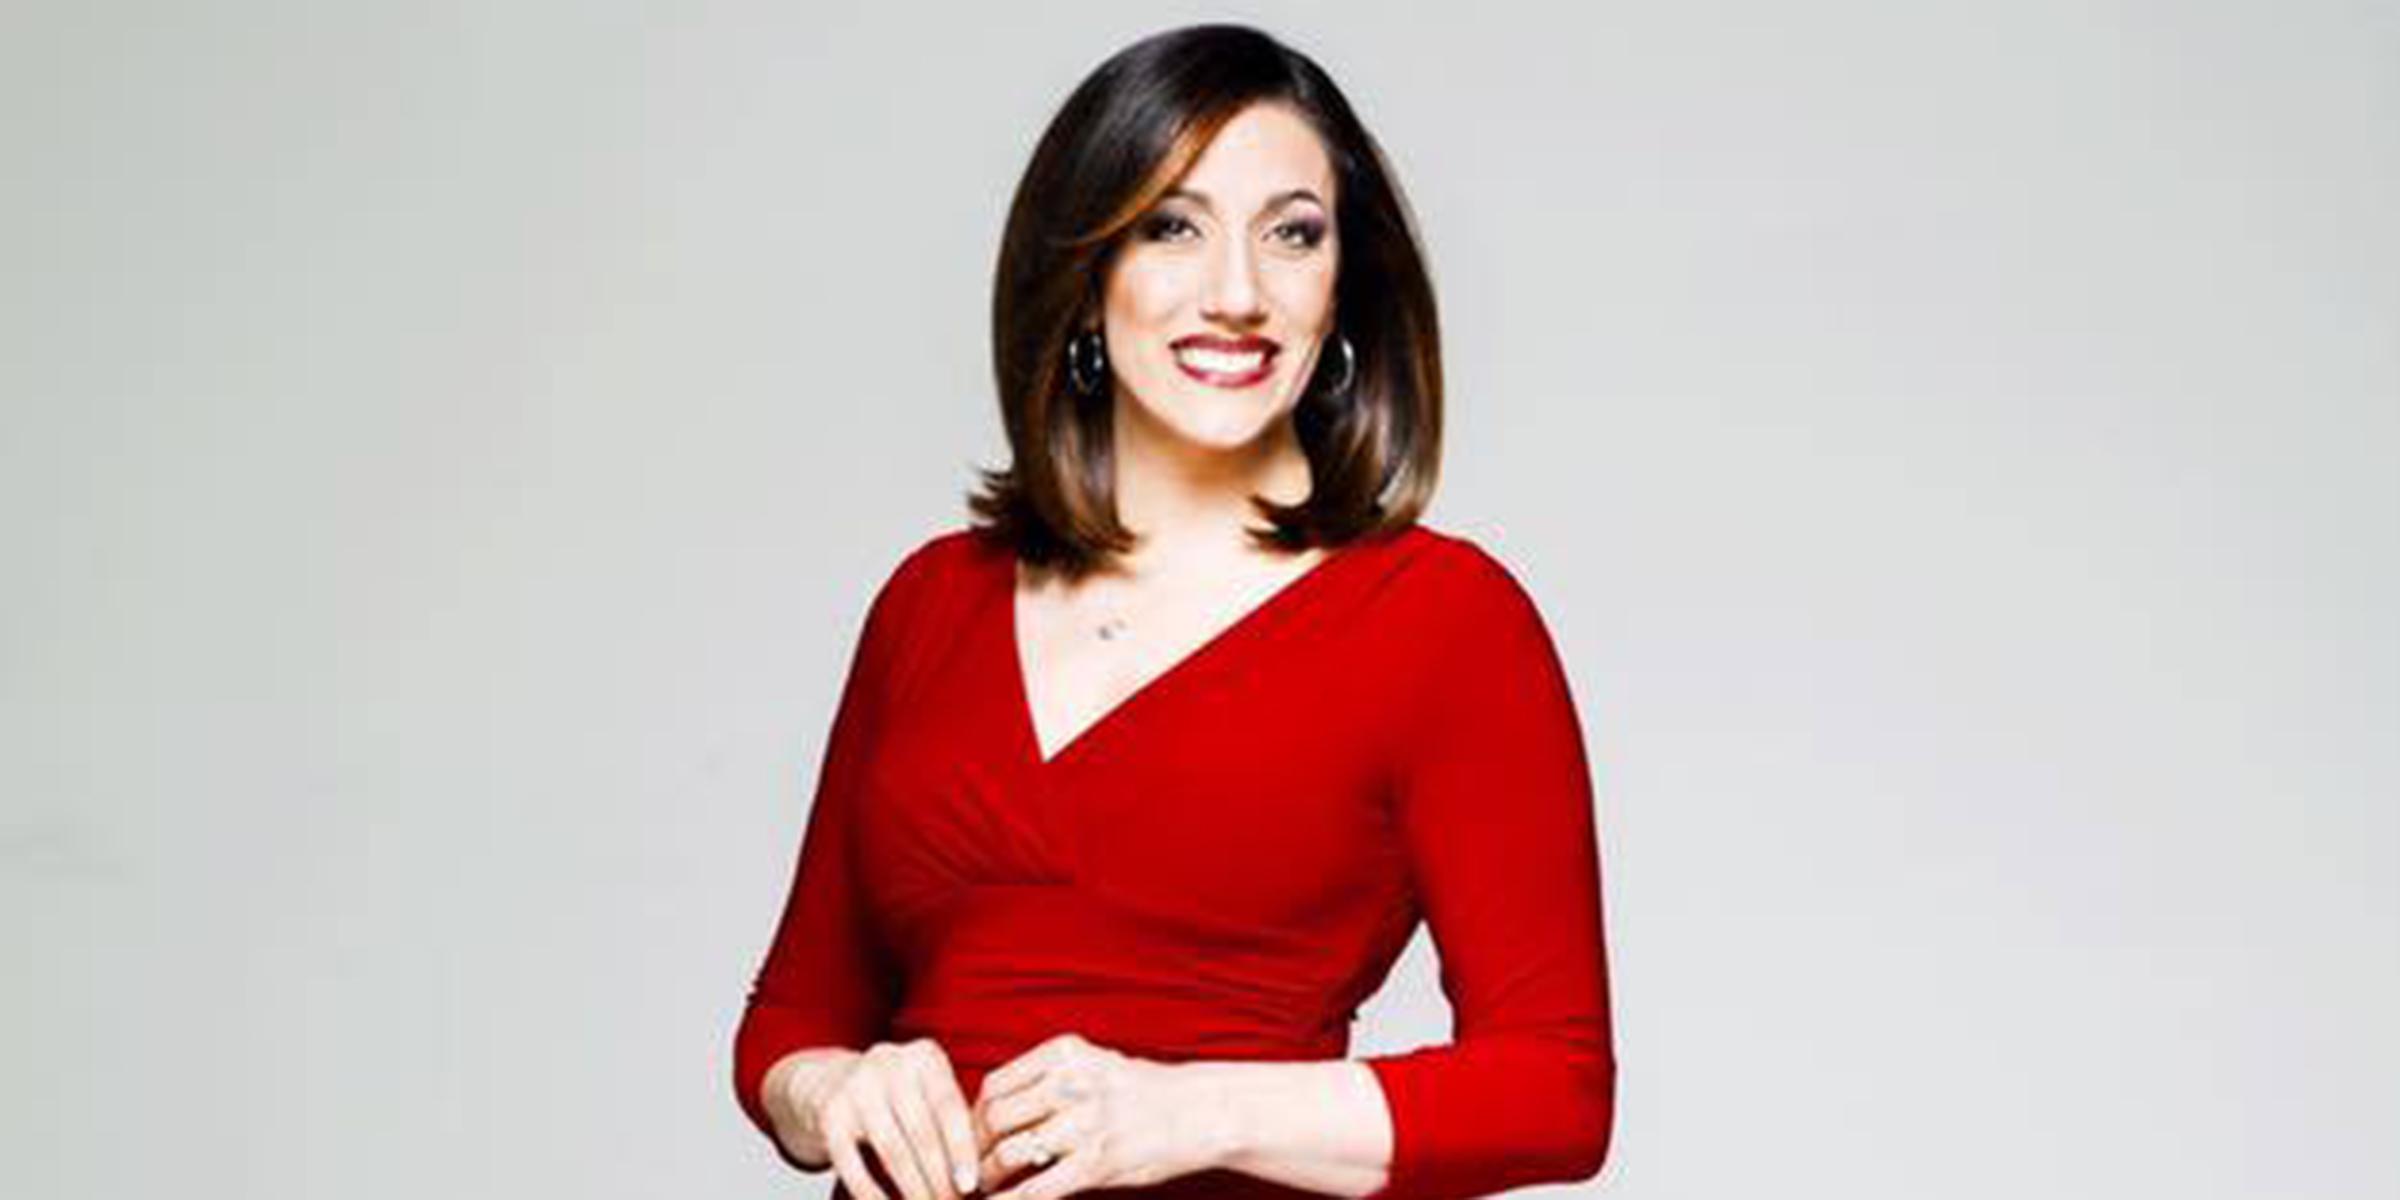 TV anchor Michelle Velez has cancer after molar pregnancy